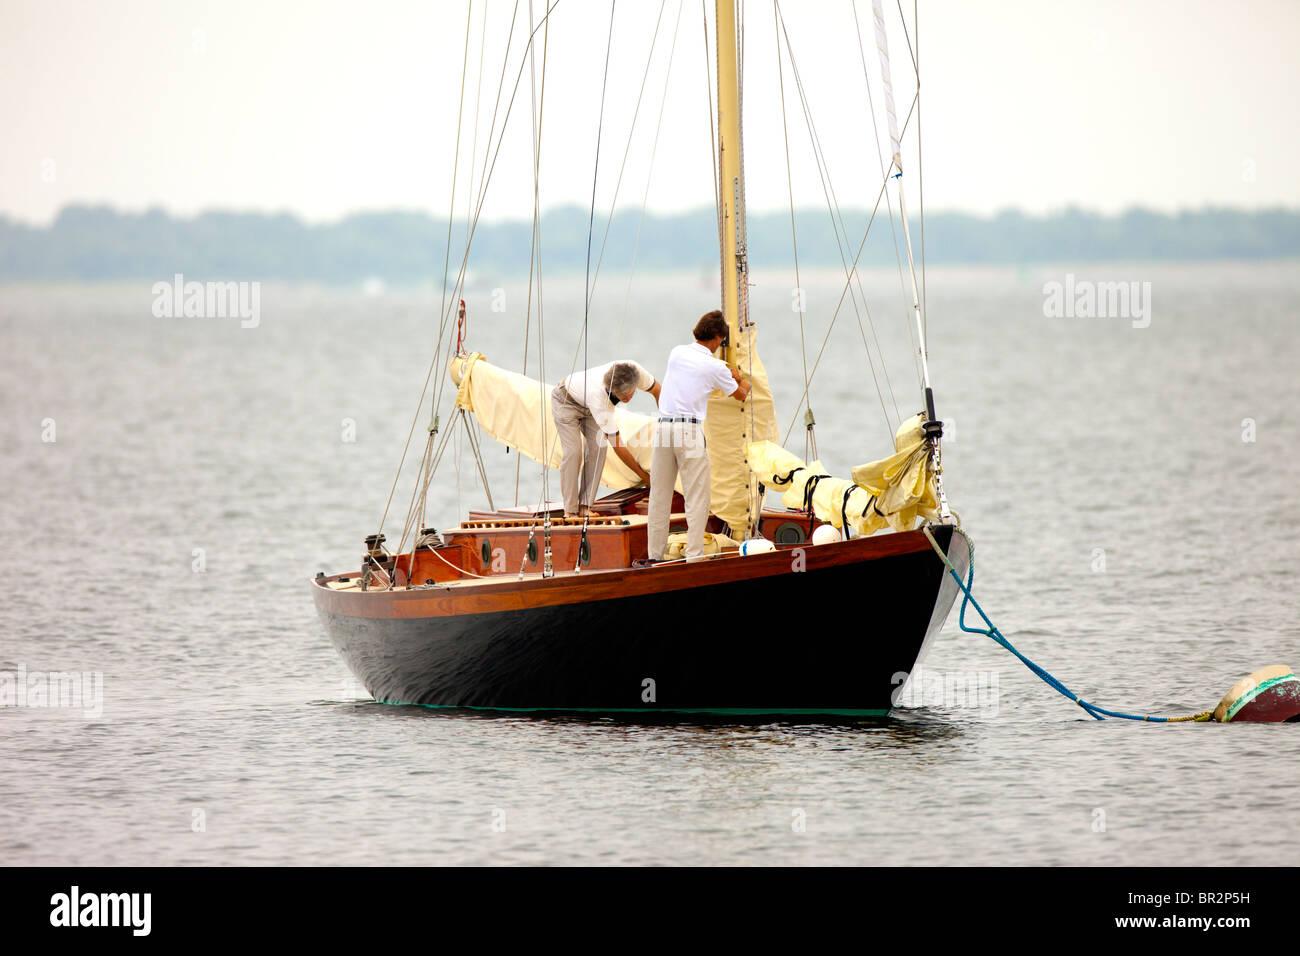 Zwei Männer setzen Segel Segelboot Stockbild